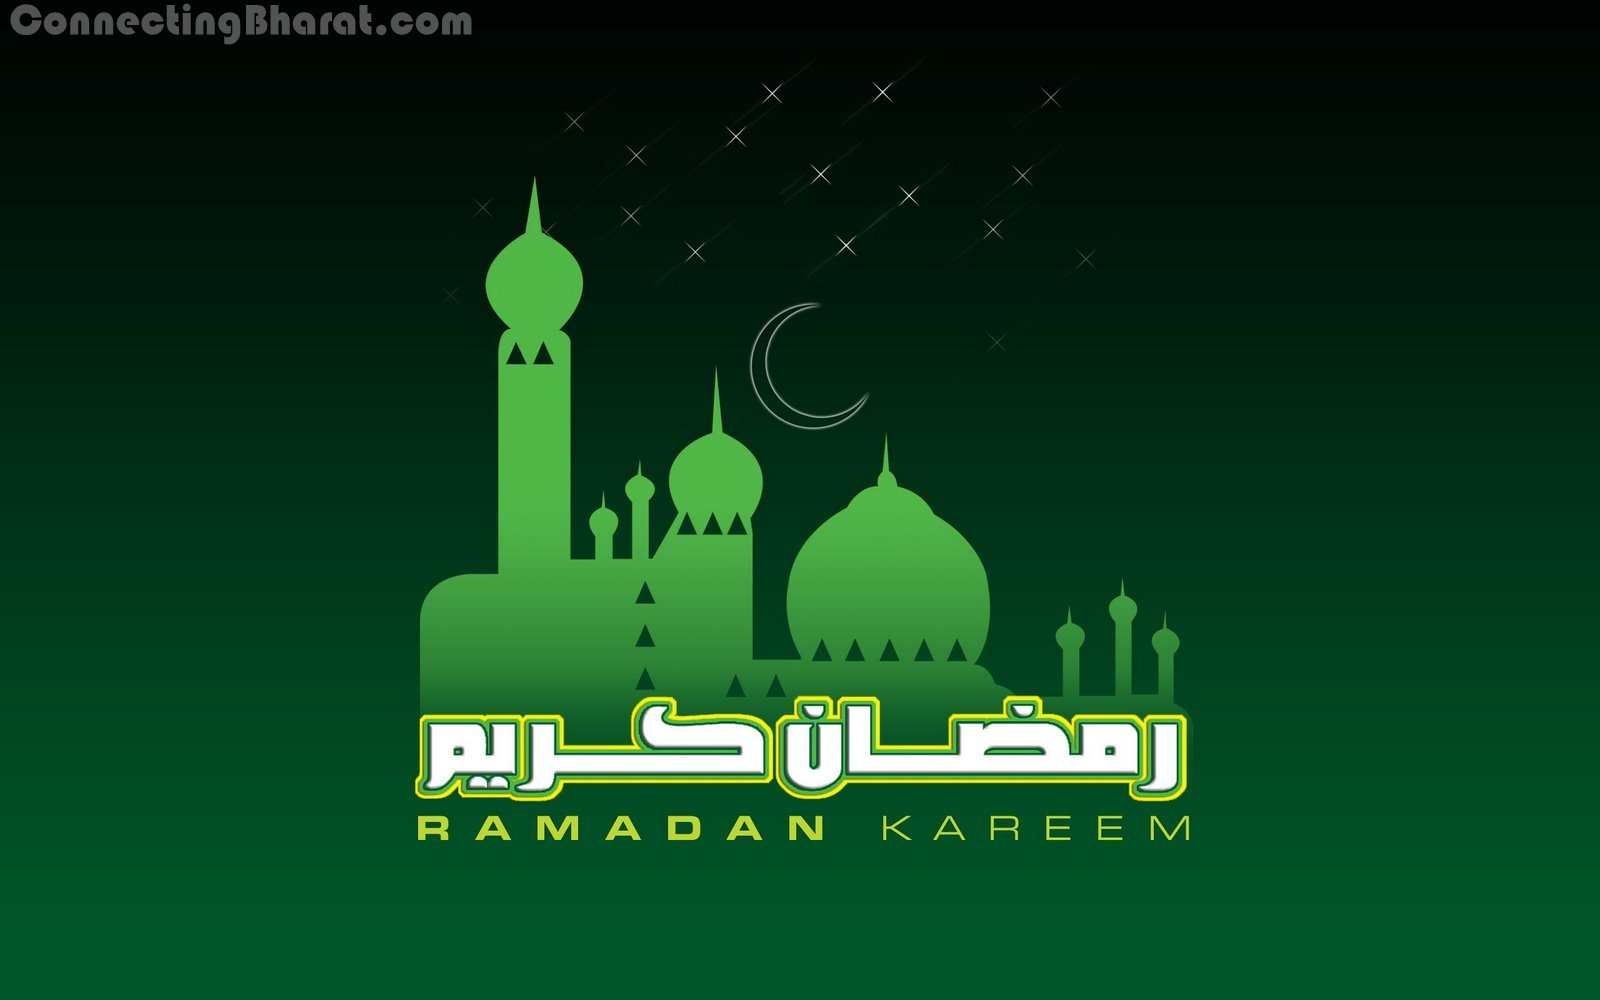 Ramadan and eid mubarak 2013 ramadan eid mubarak 2013 wallpapers ramadan eid mubarak 2013 wallpapers images pictures stills greetings quotes kristyandbryce Images